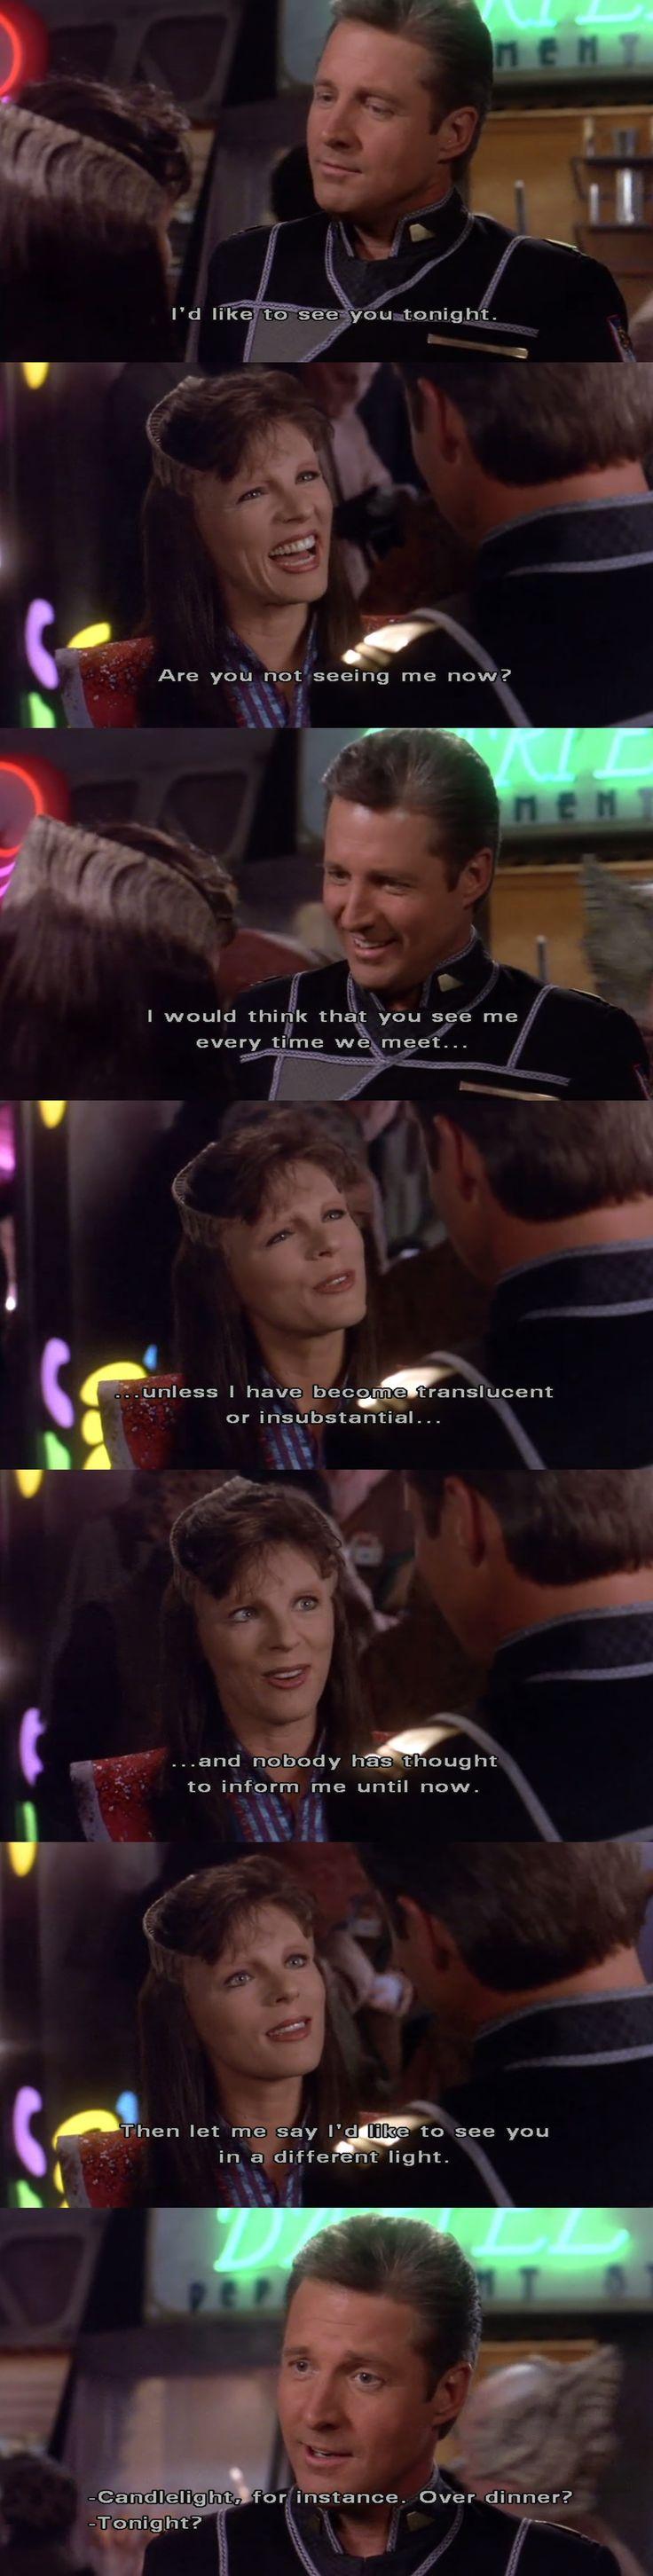 one of my favorite Delenn/Sheridan moments. Babylon 5 rewatch 3x12 - interspecies flirting is so cute :)